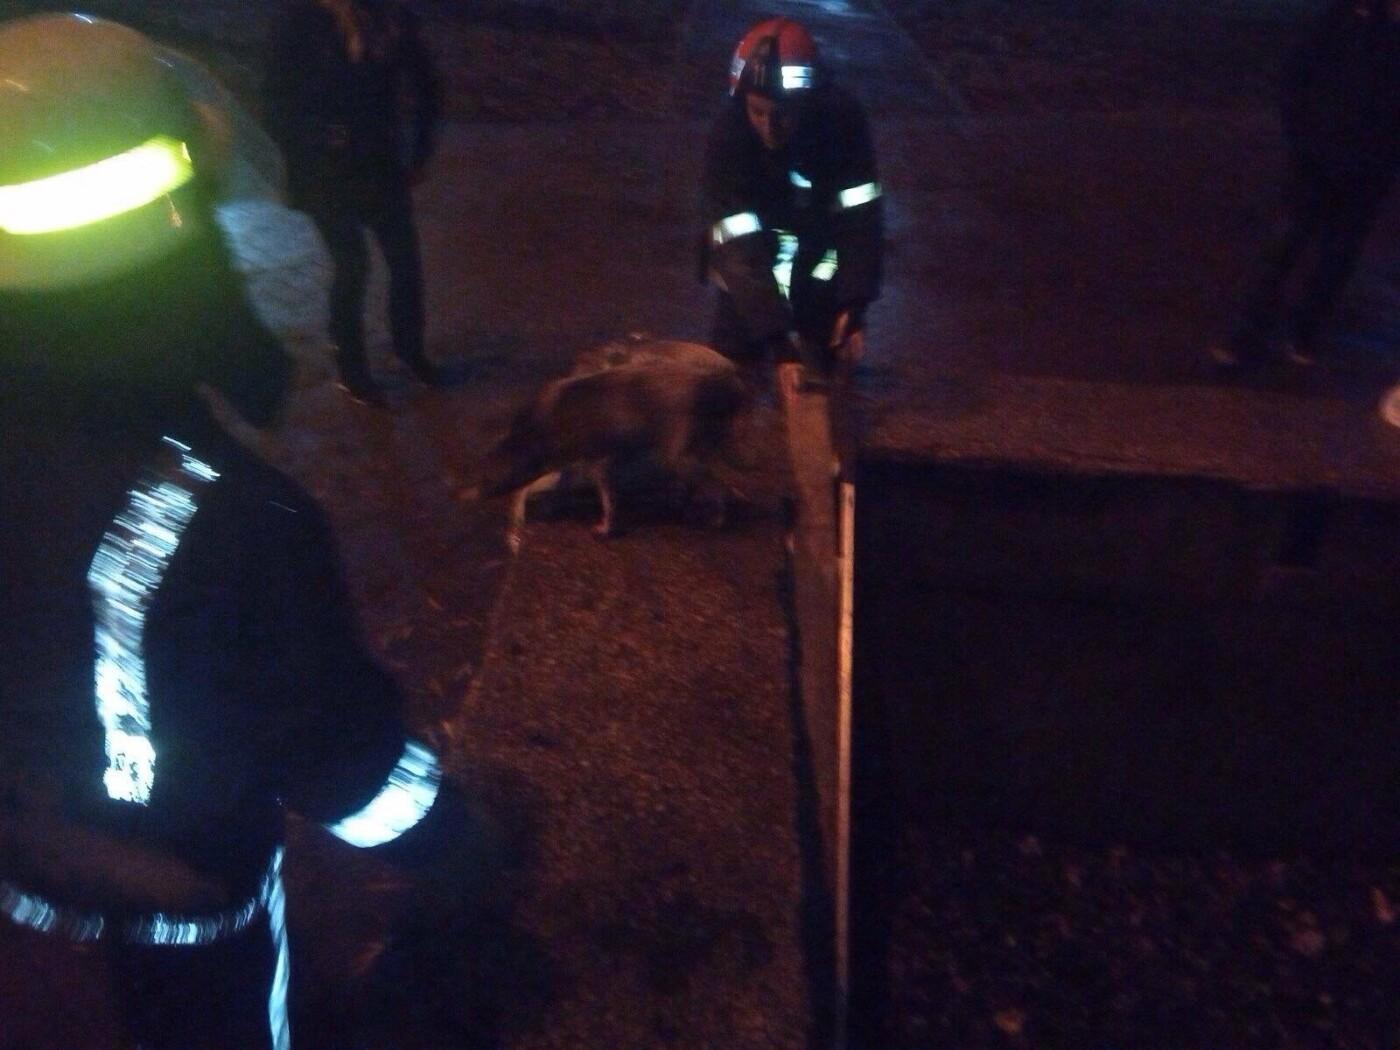 На Днепропетровщине спасатели доставали собаку из ловушки, - ФОТО, фото-2